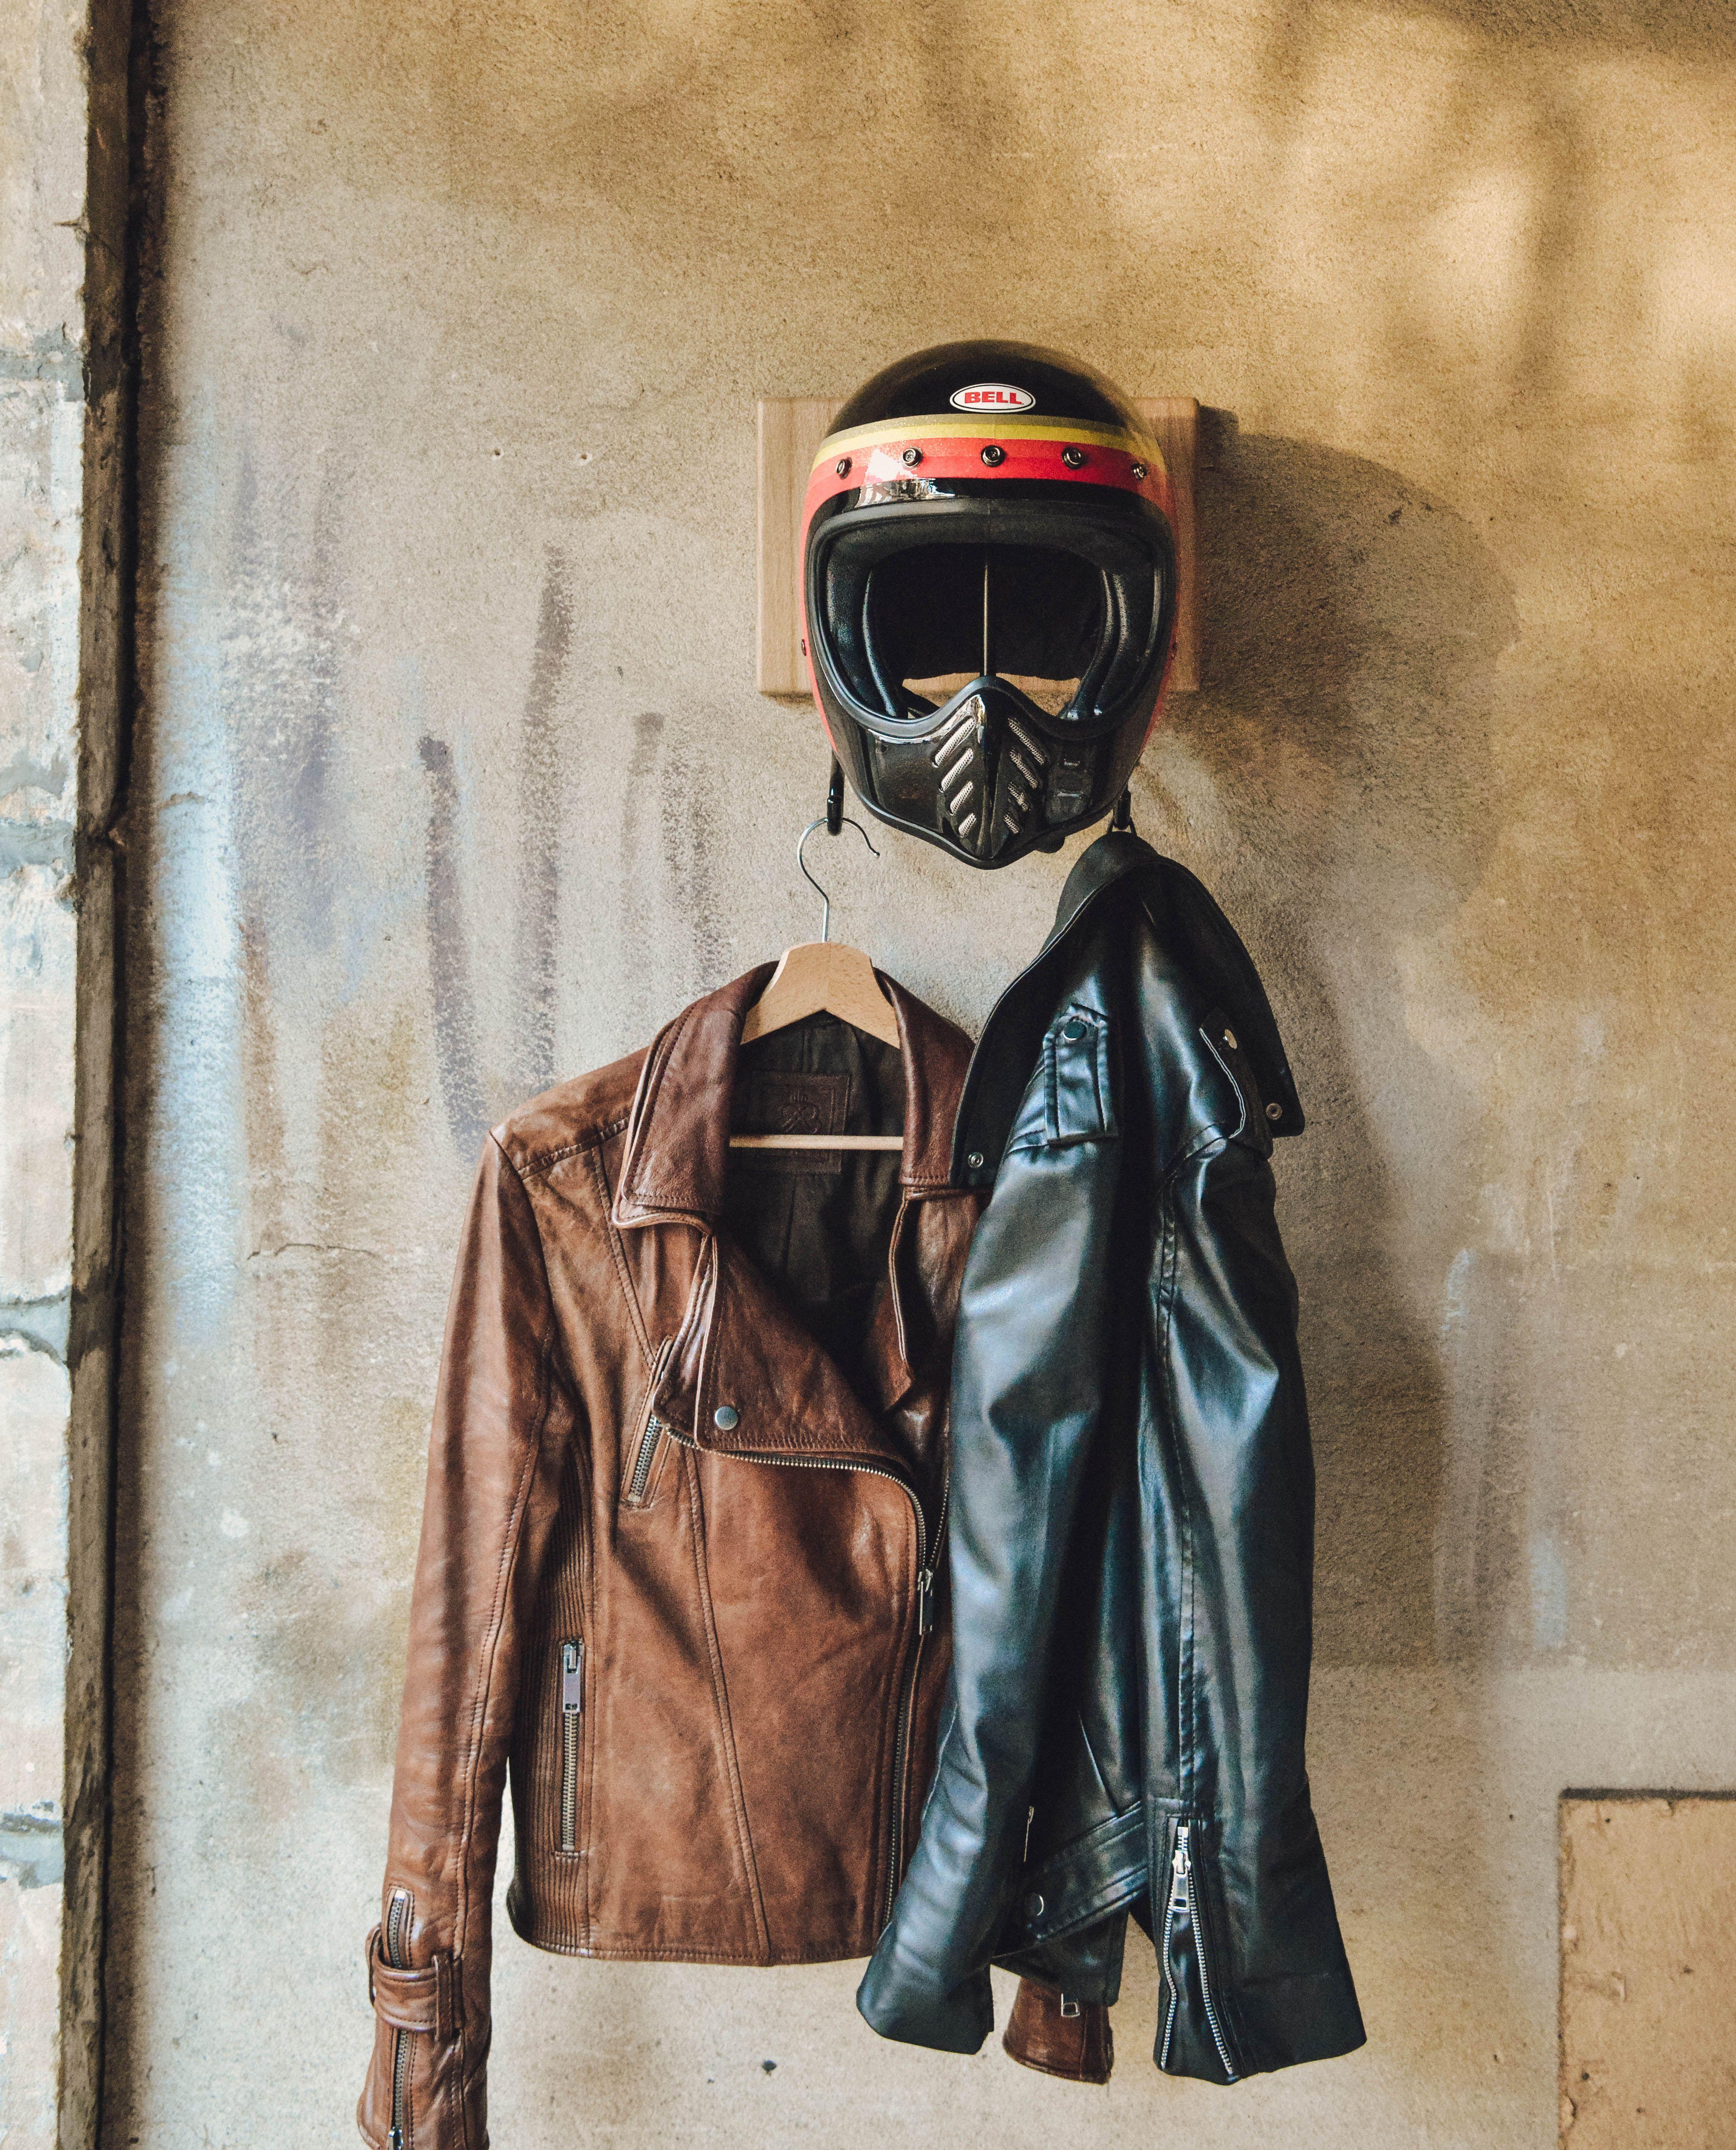 Porte Casque Helmet Rack France Waynscot Motorcycle Helmet Accessoires Decor Interieur Handmade Bik Porte Casque Vetement Equitation Casque